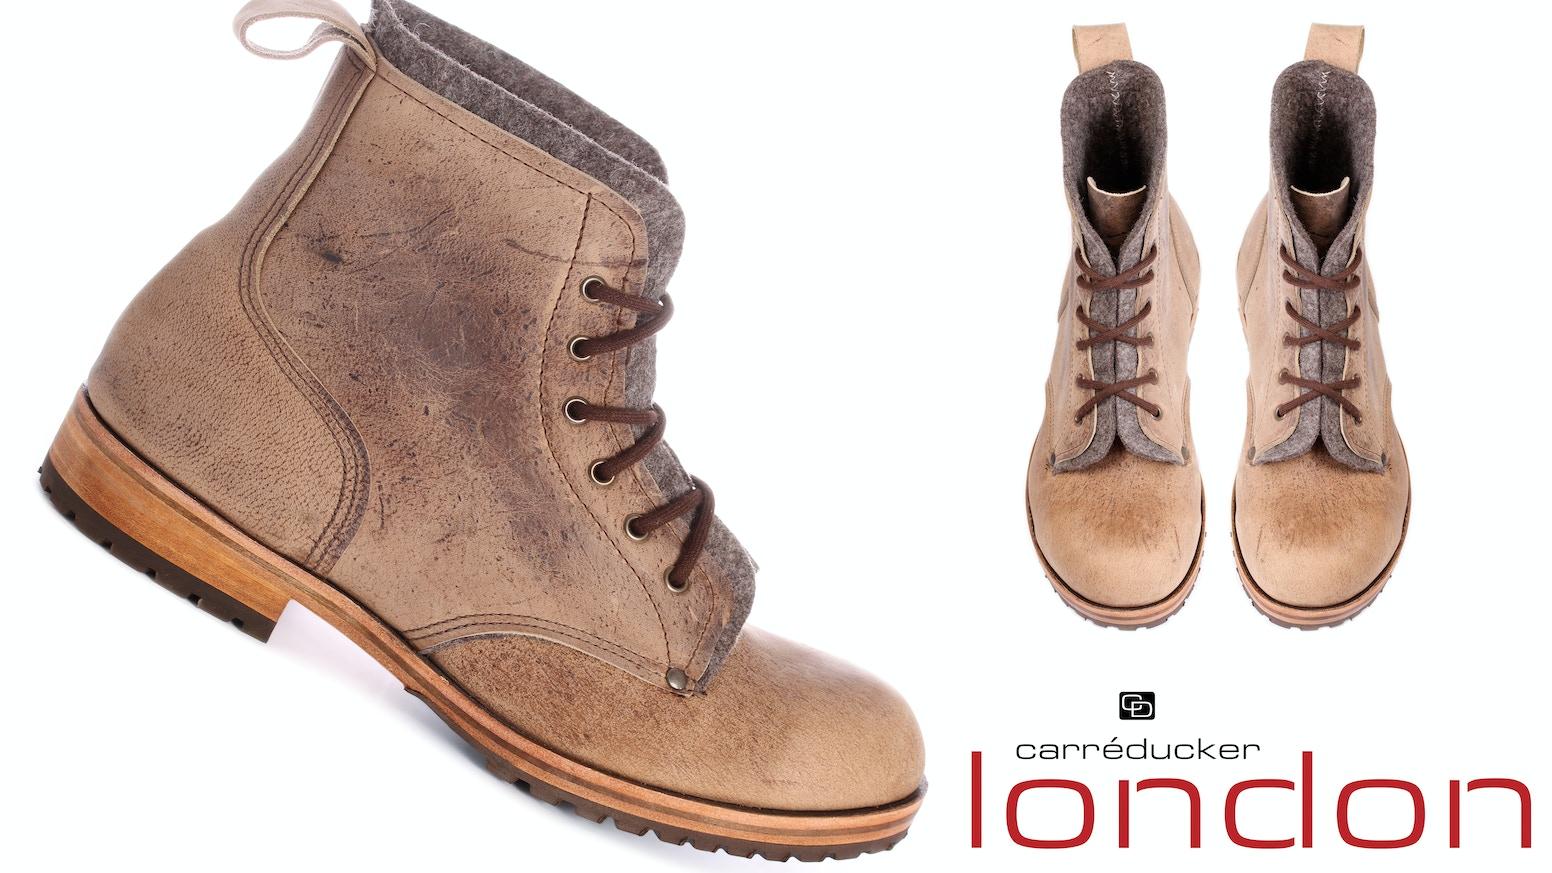 Carreducker Tor Boot By London Limited Kickstarter D Island Shoes Boots Chukka Slip On Dark Brown Leather